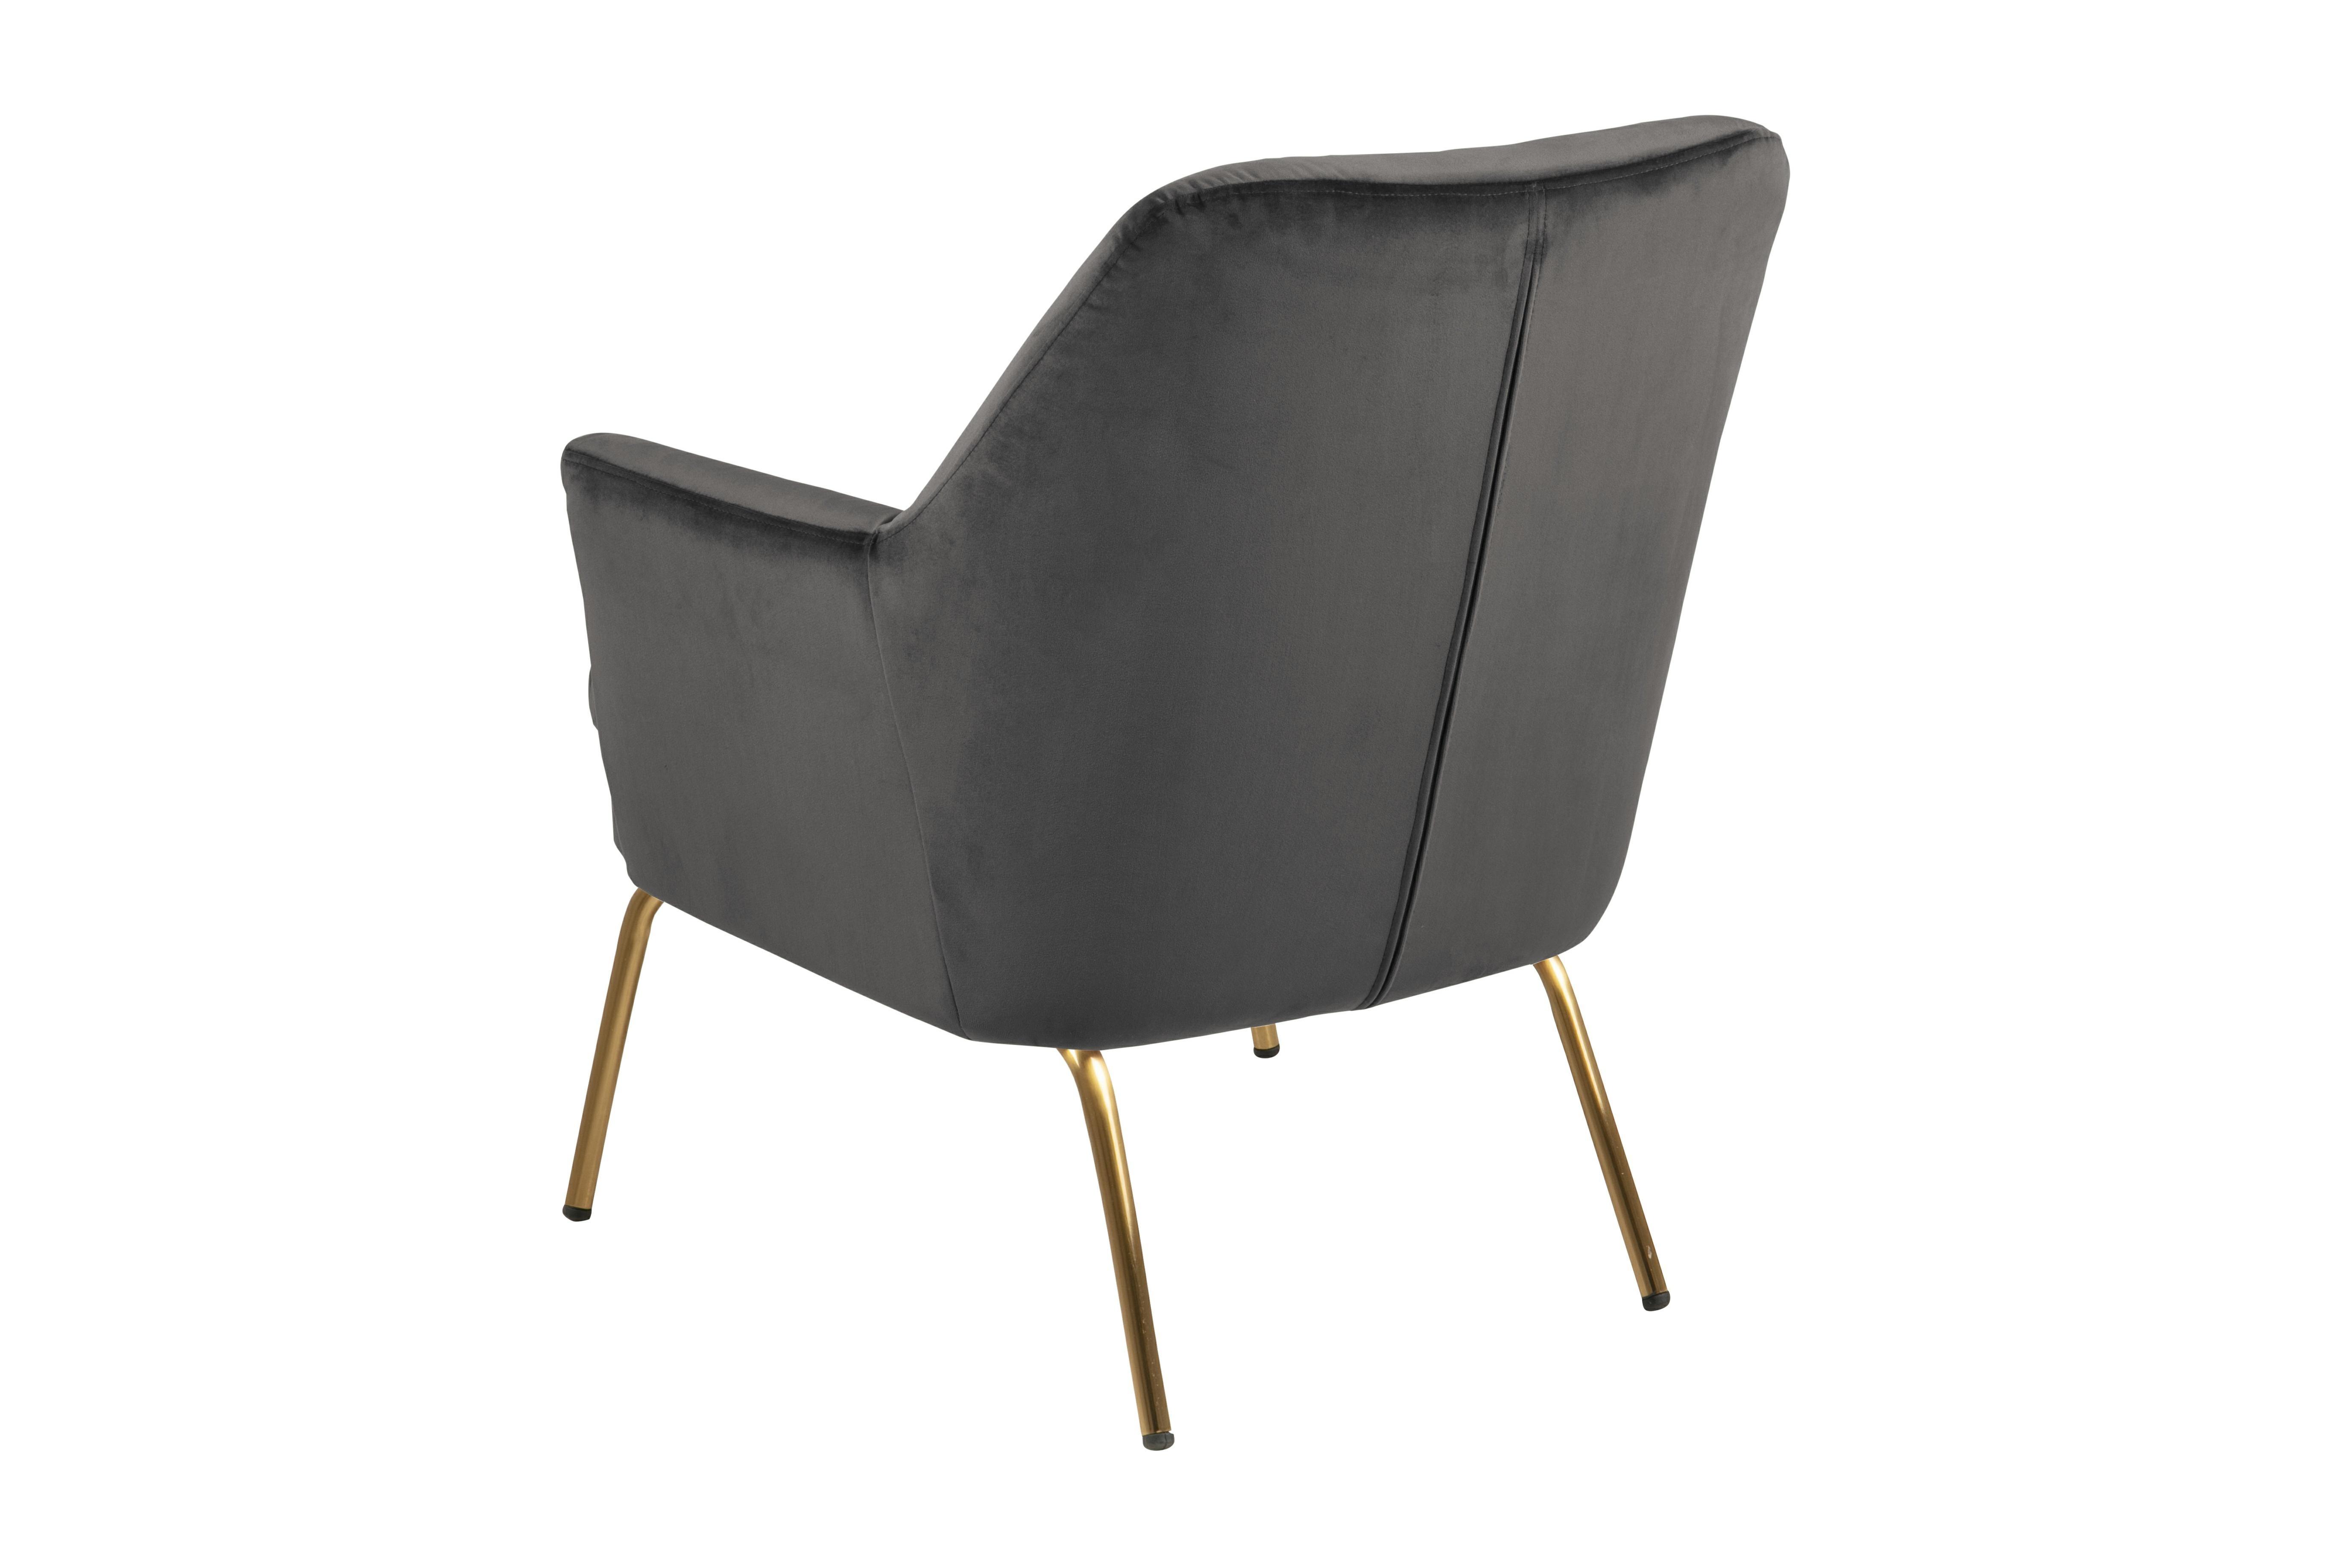 Fotel Chisa VIC Dark Grey/Gold - zdjęcie nr 1